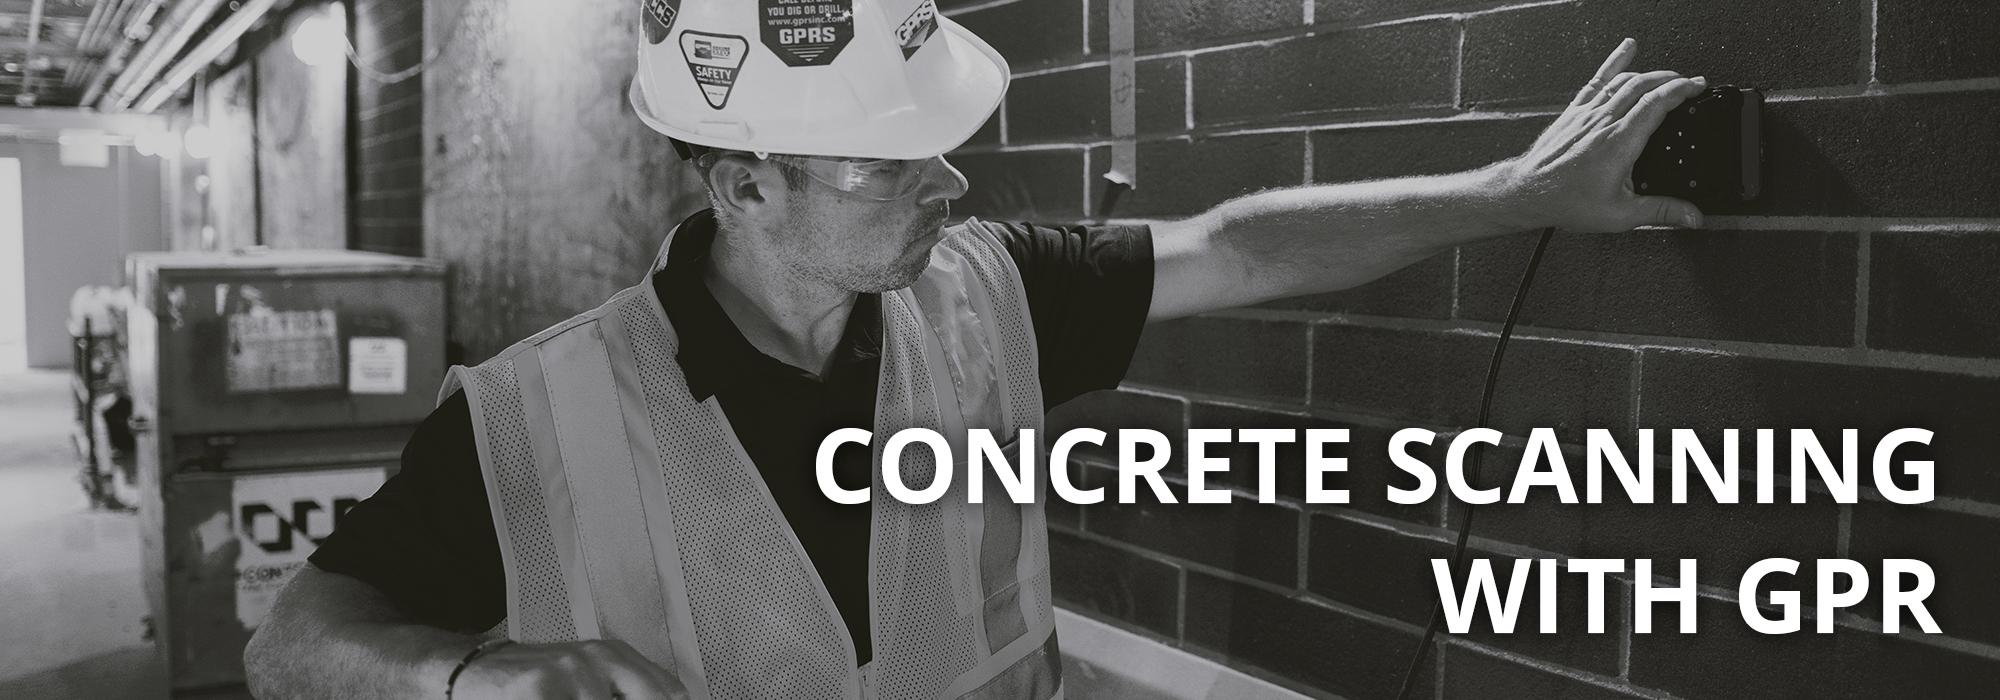 Concrete Scanning